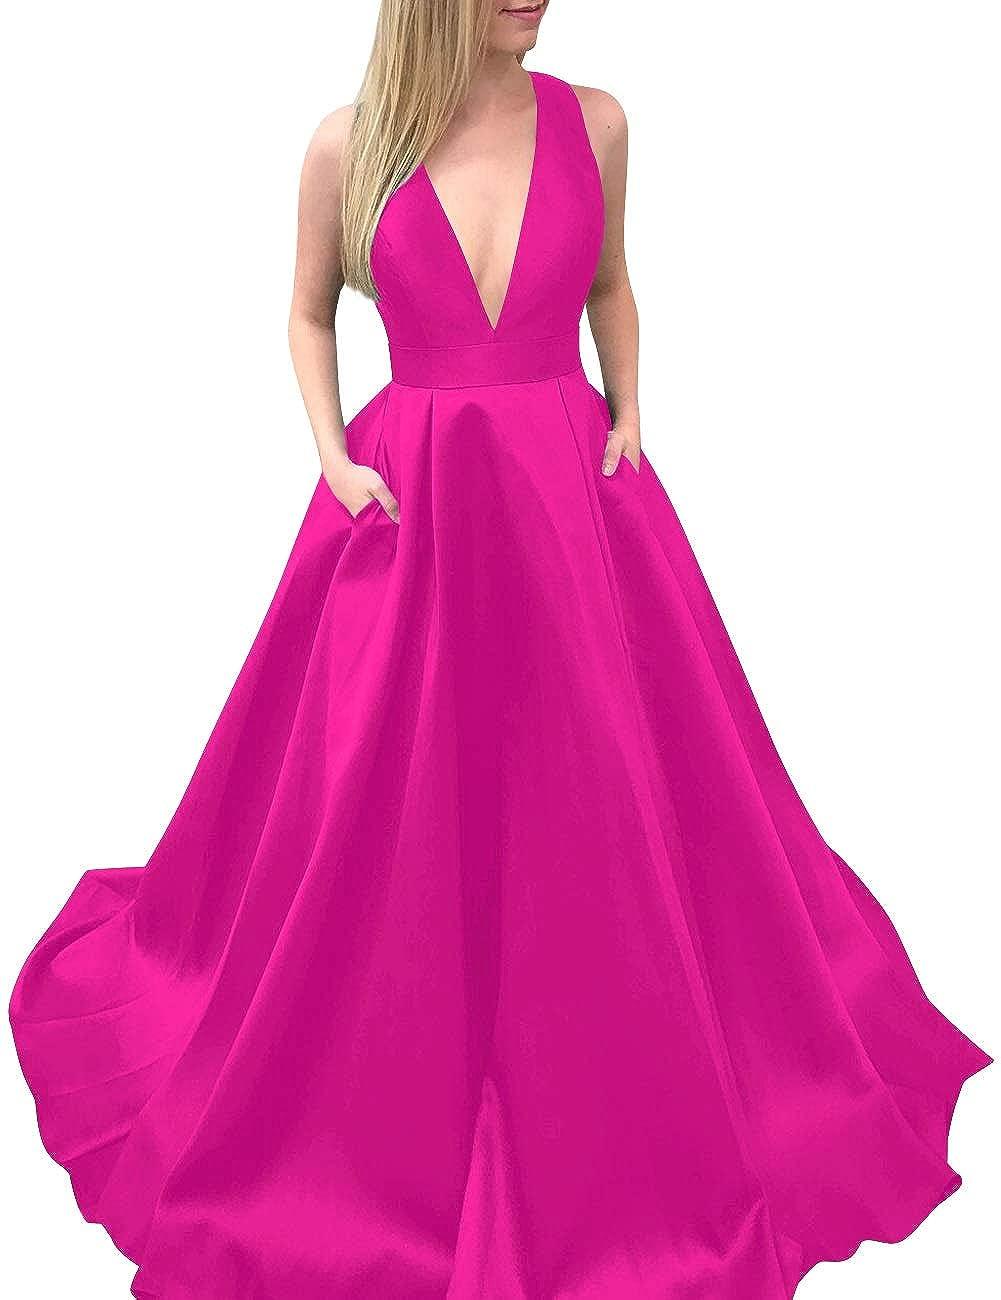 Fuchsia MorySong Women's Deep VNeck Bowknot Back Satin Prom Evening Dress with Pockets